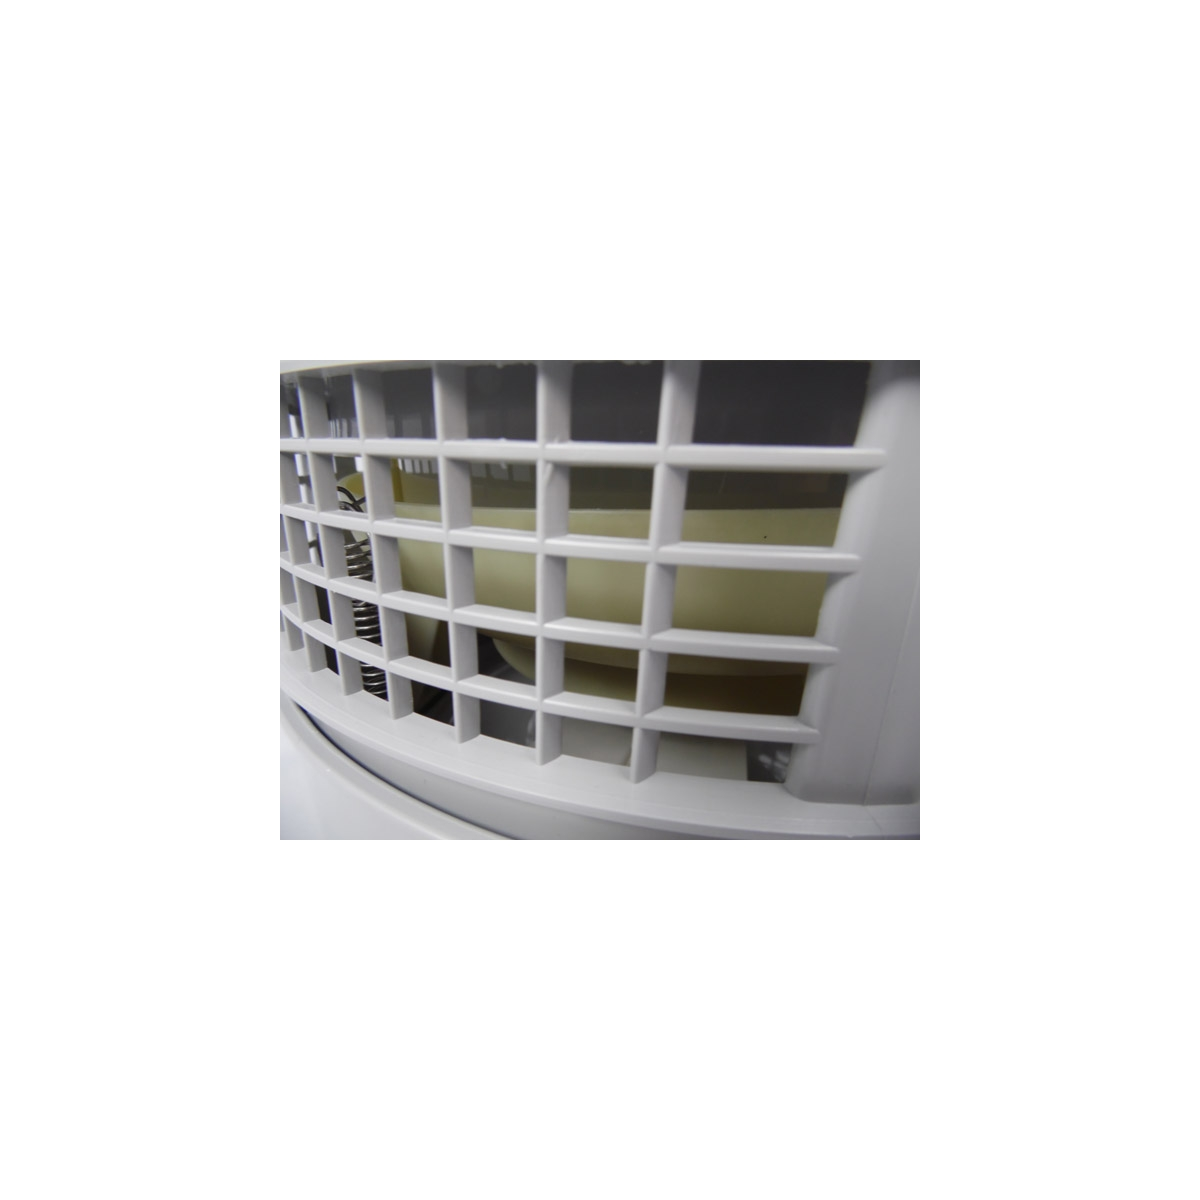 faran humidificateur d 39 air centrifuge hr 15 hydrozone. Black Bedroom Furniture Sets. Home Design Ideas